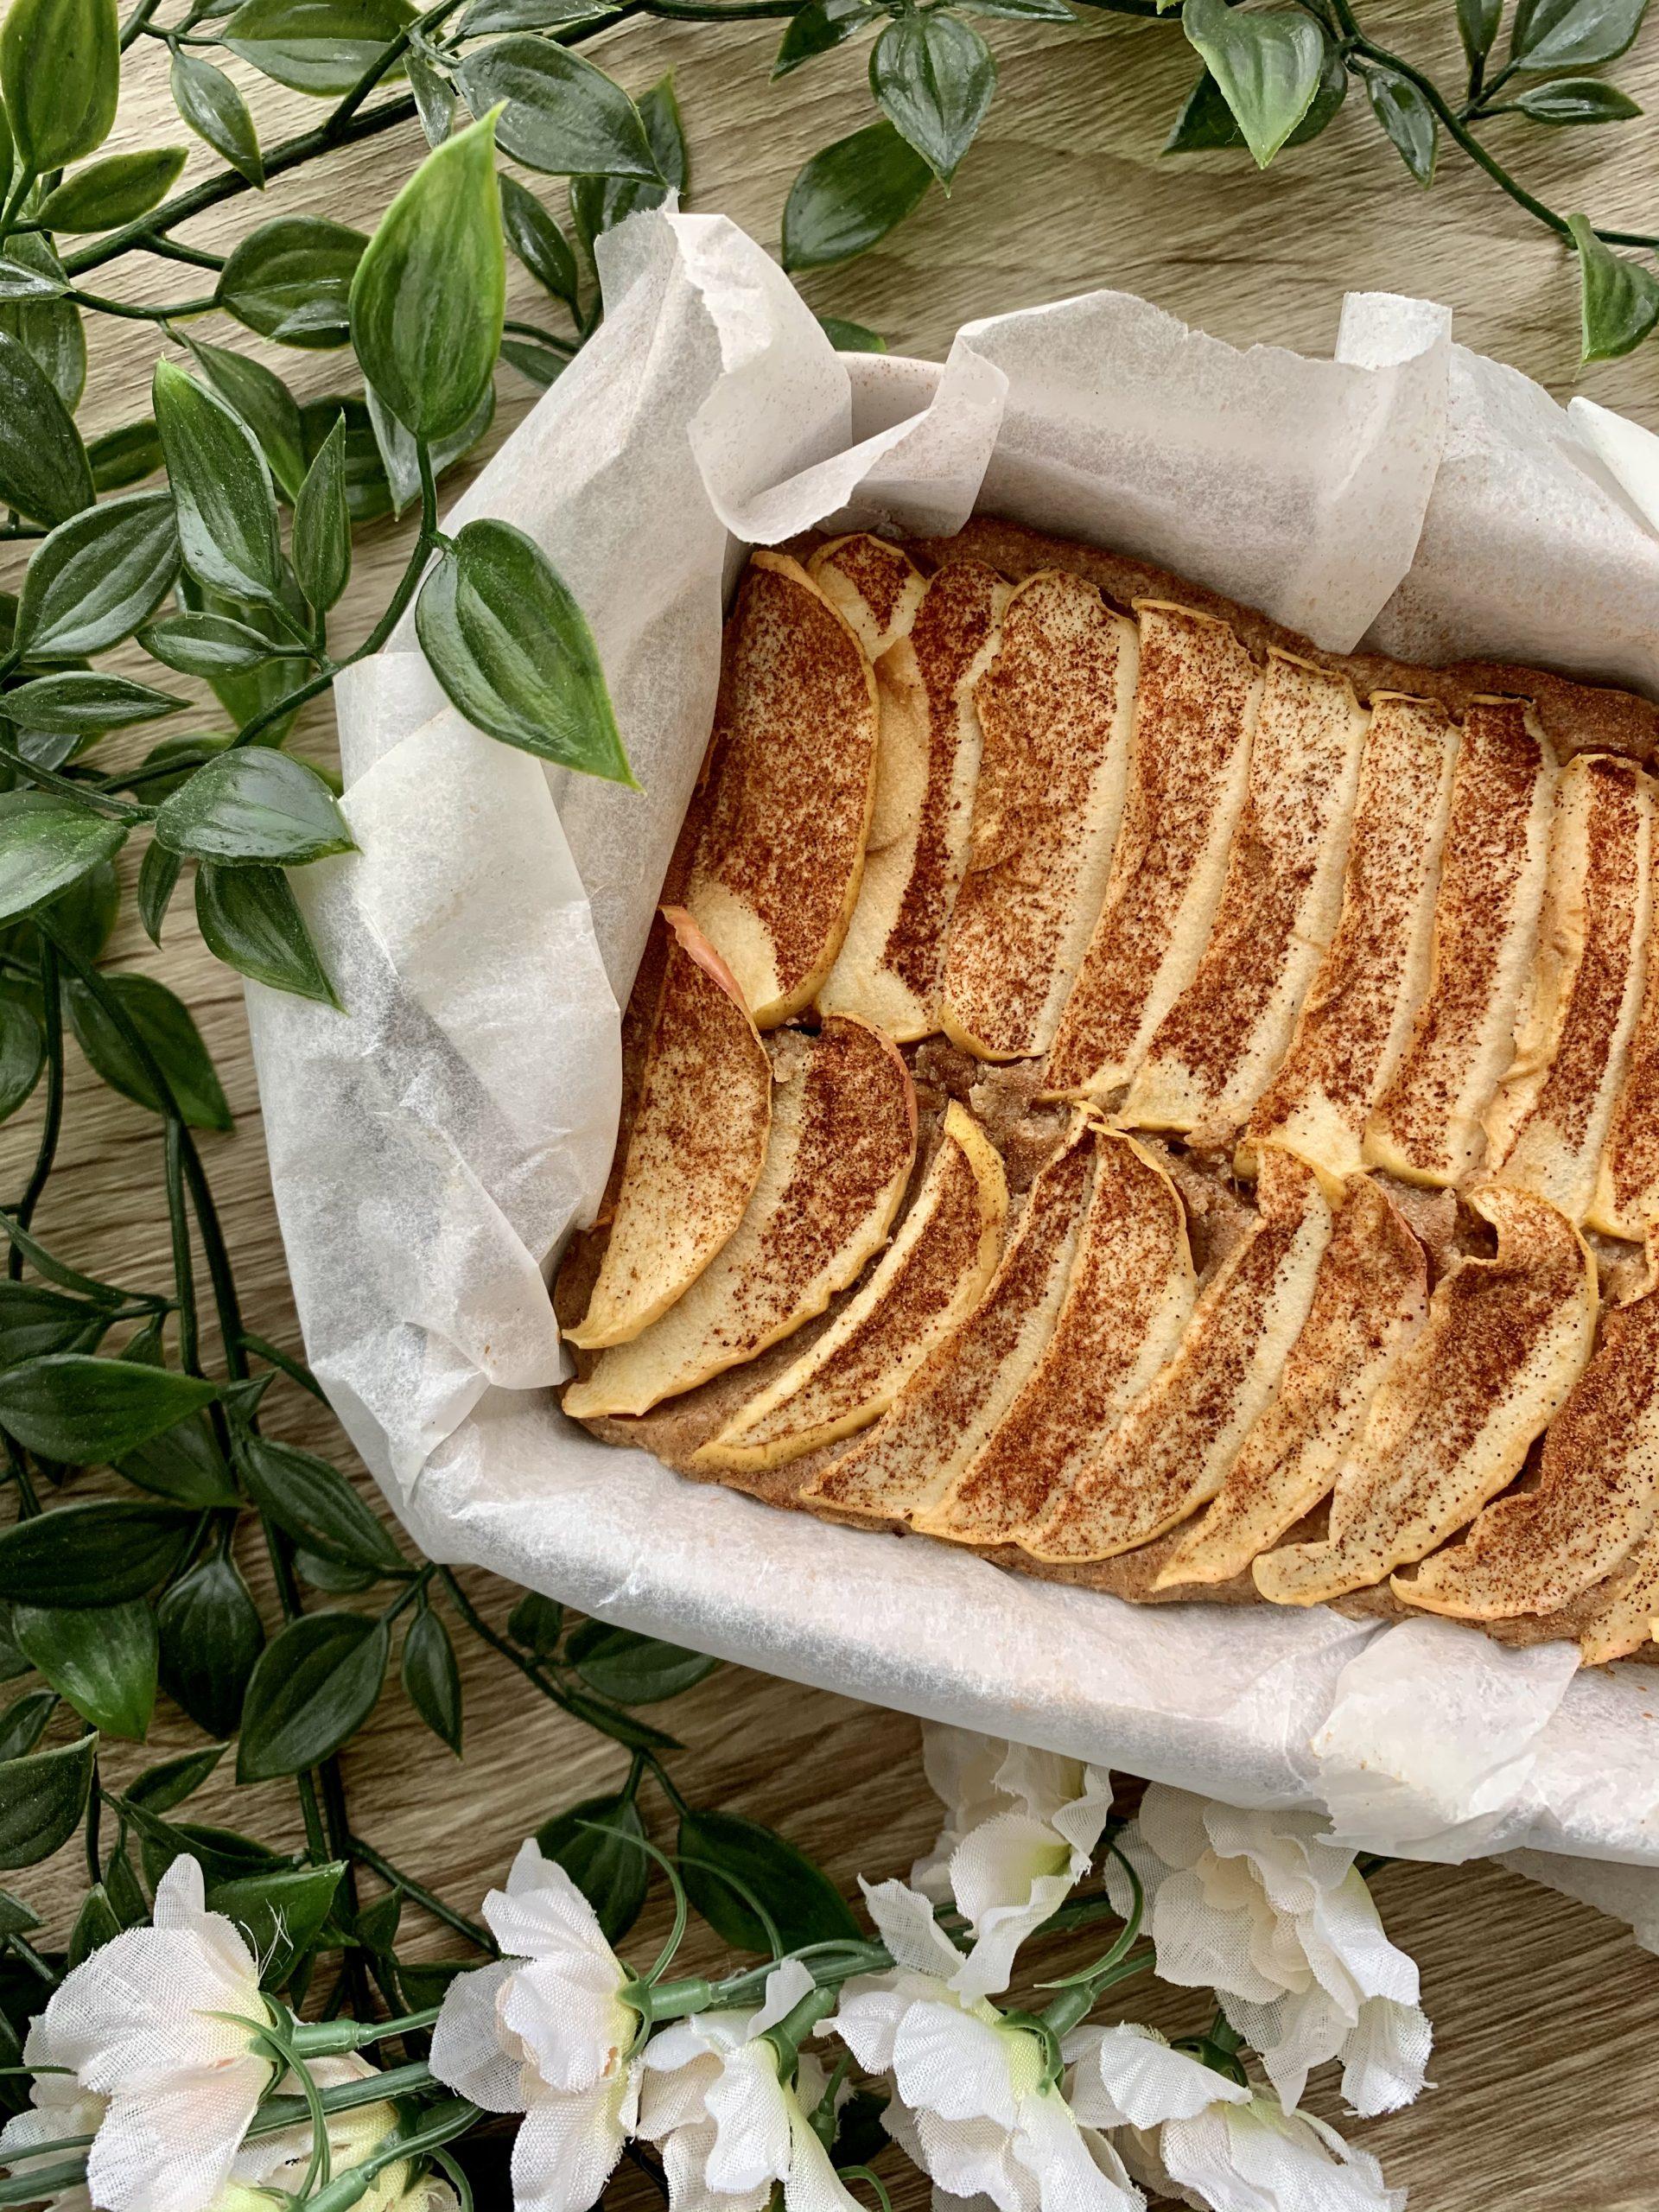 proteinrik äppelkaka